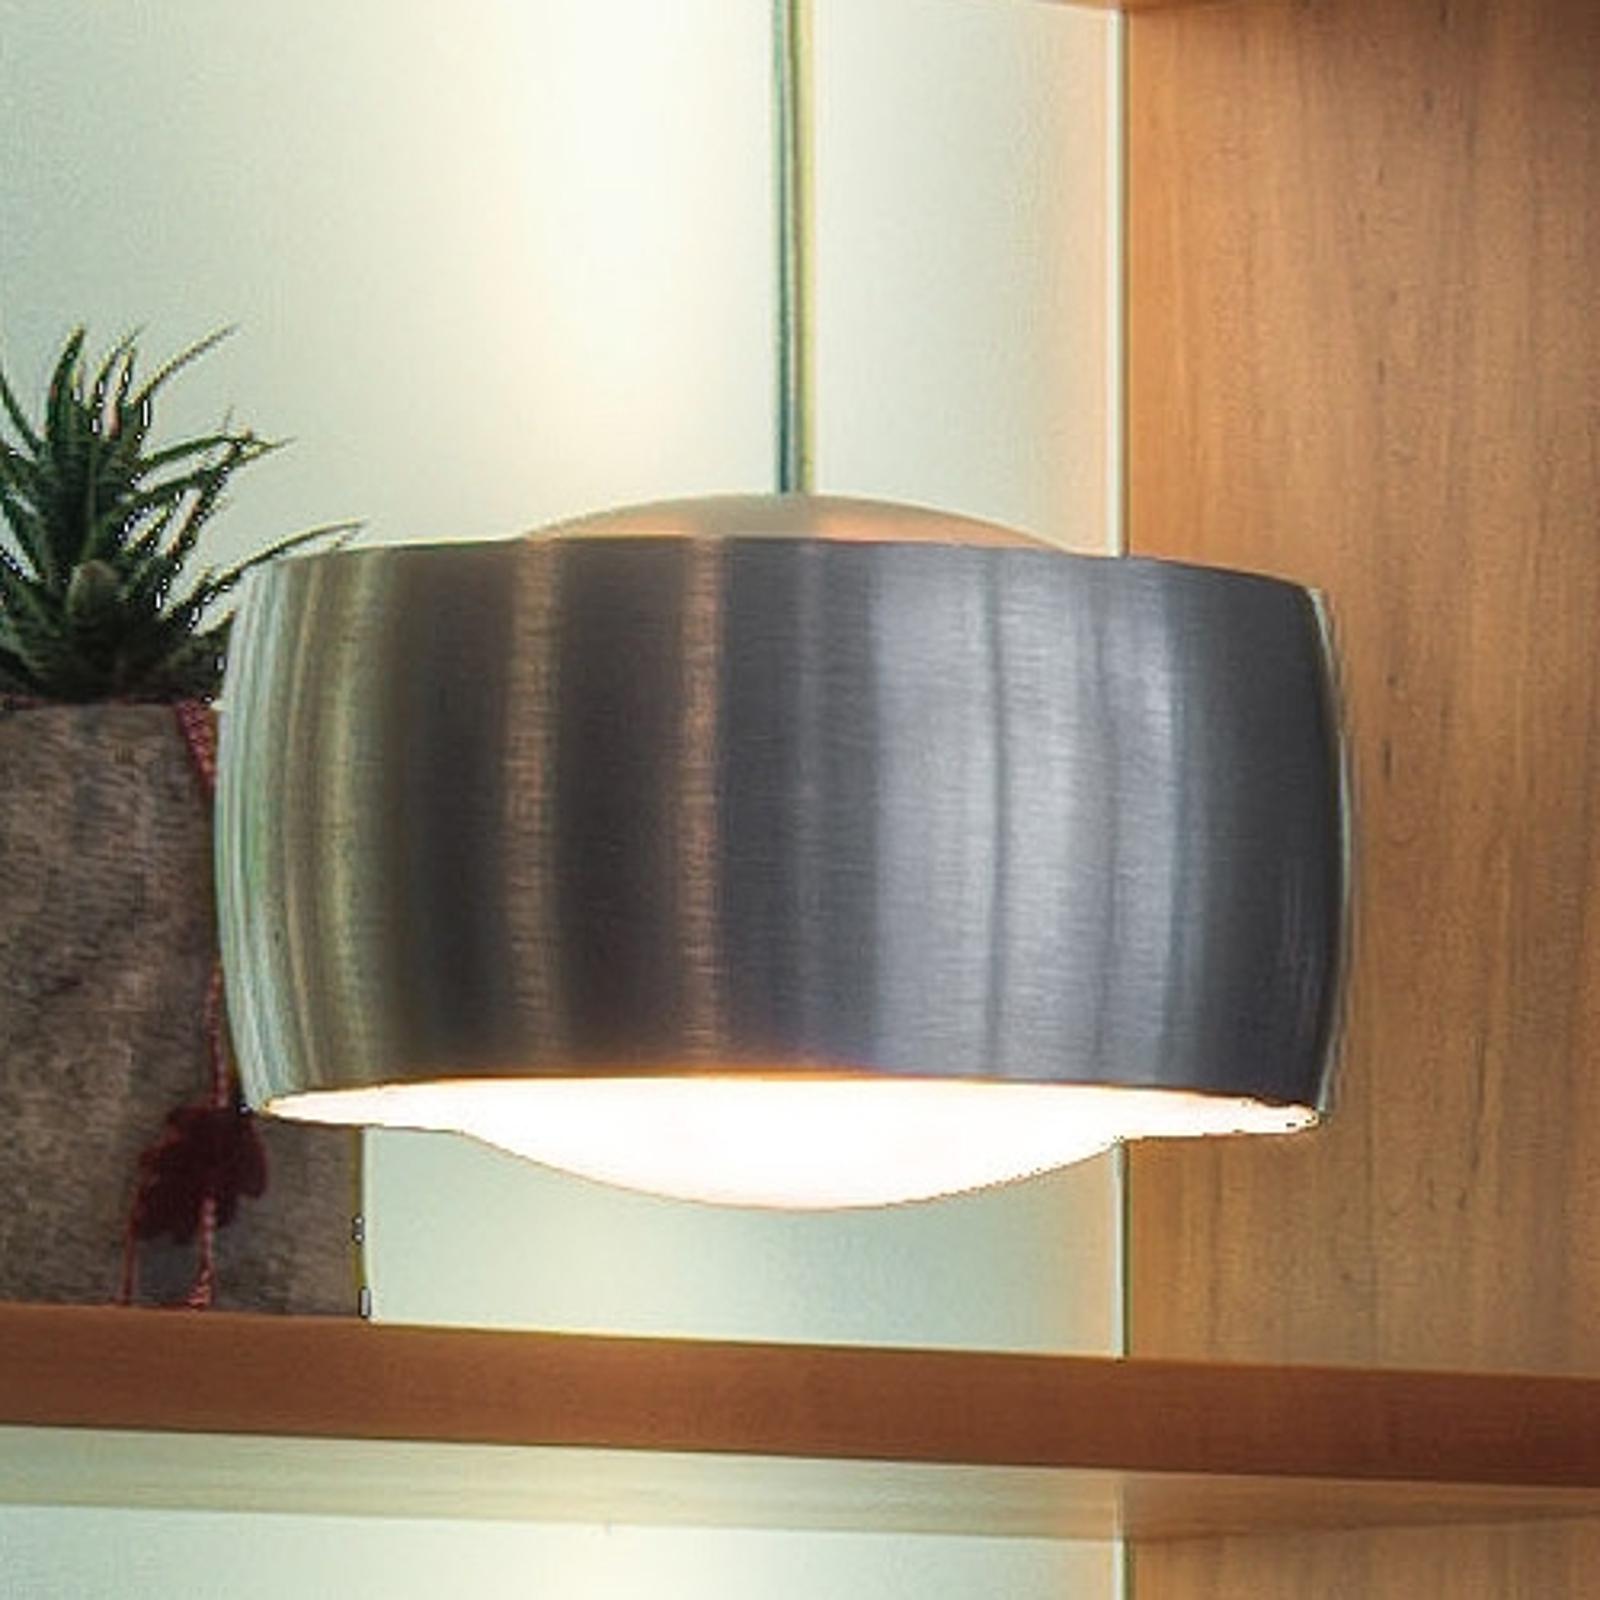 Hanglamp GRACE v PLUG-IN 12V, aluminium geborsteld